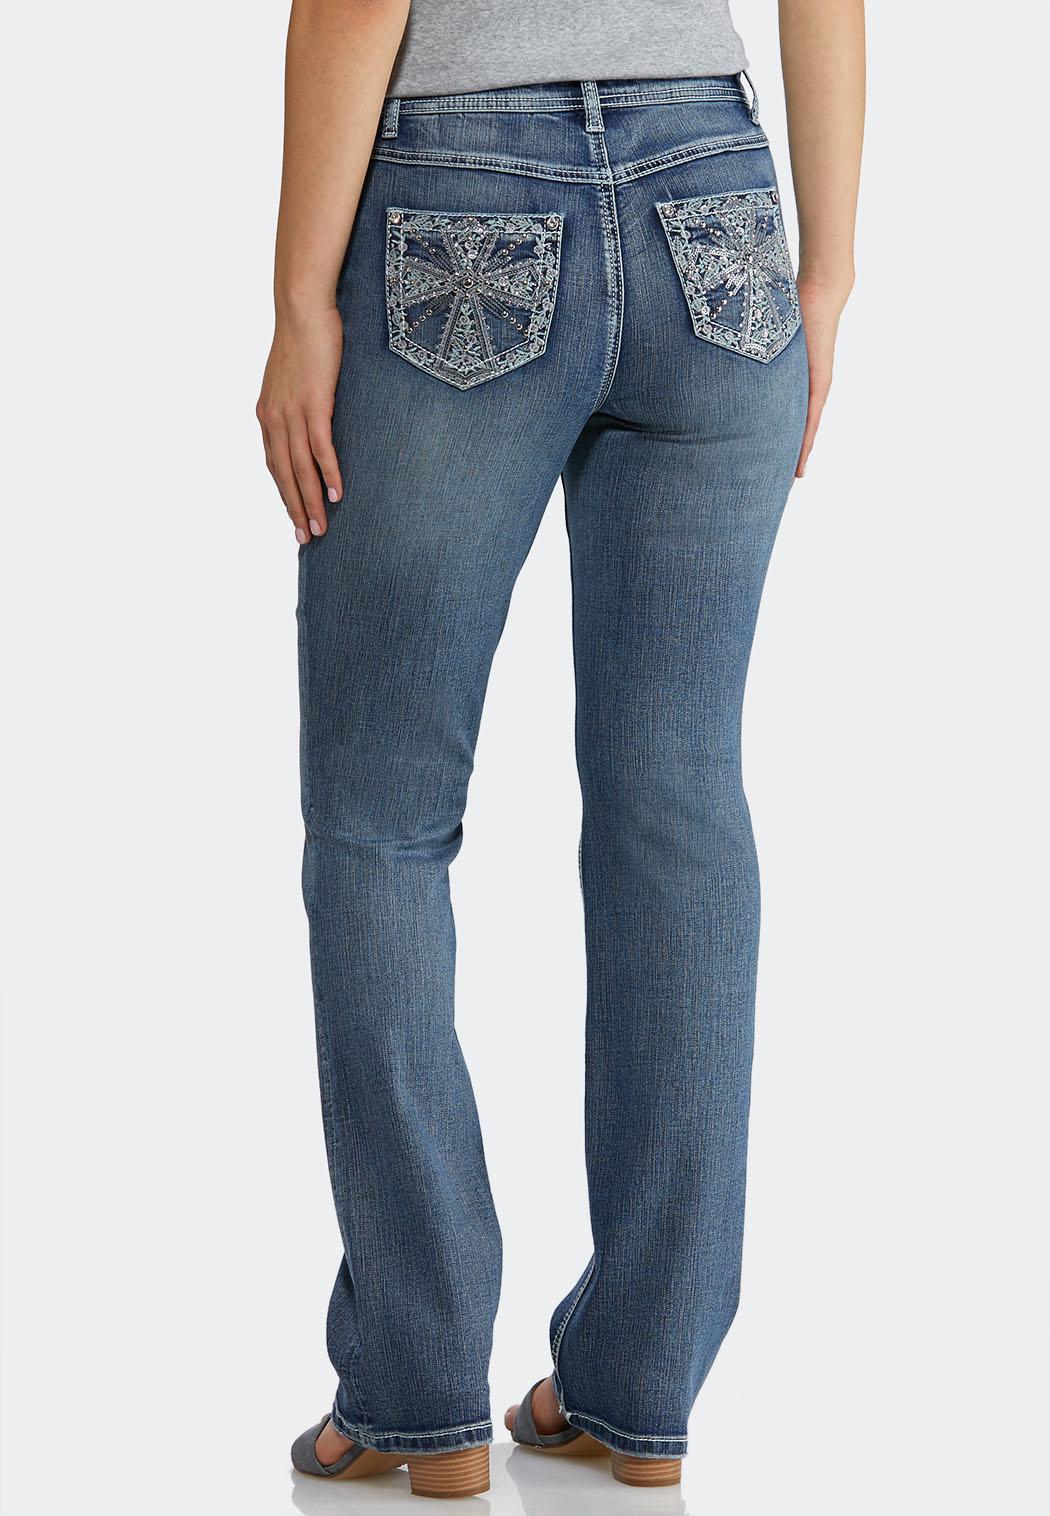 646977212b08f Women s Bootcut Jeans